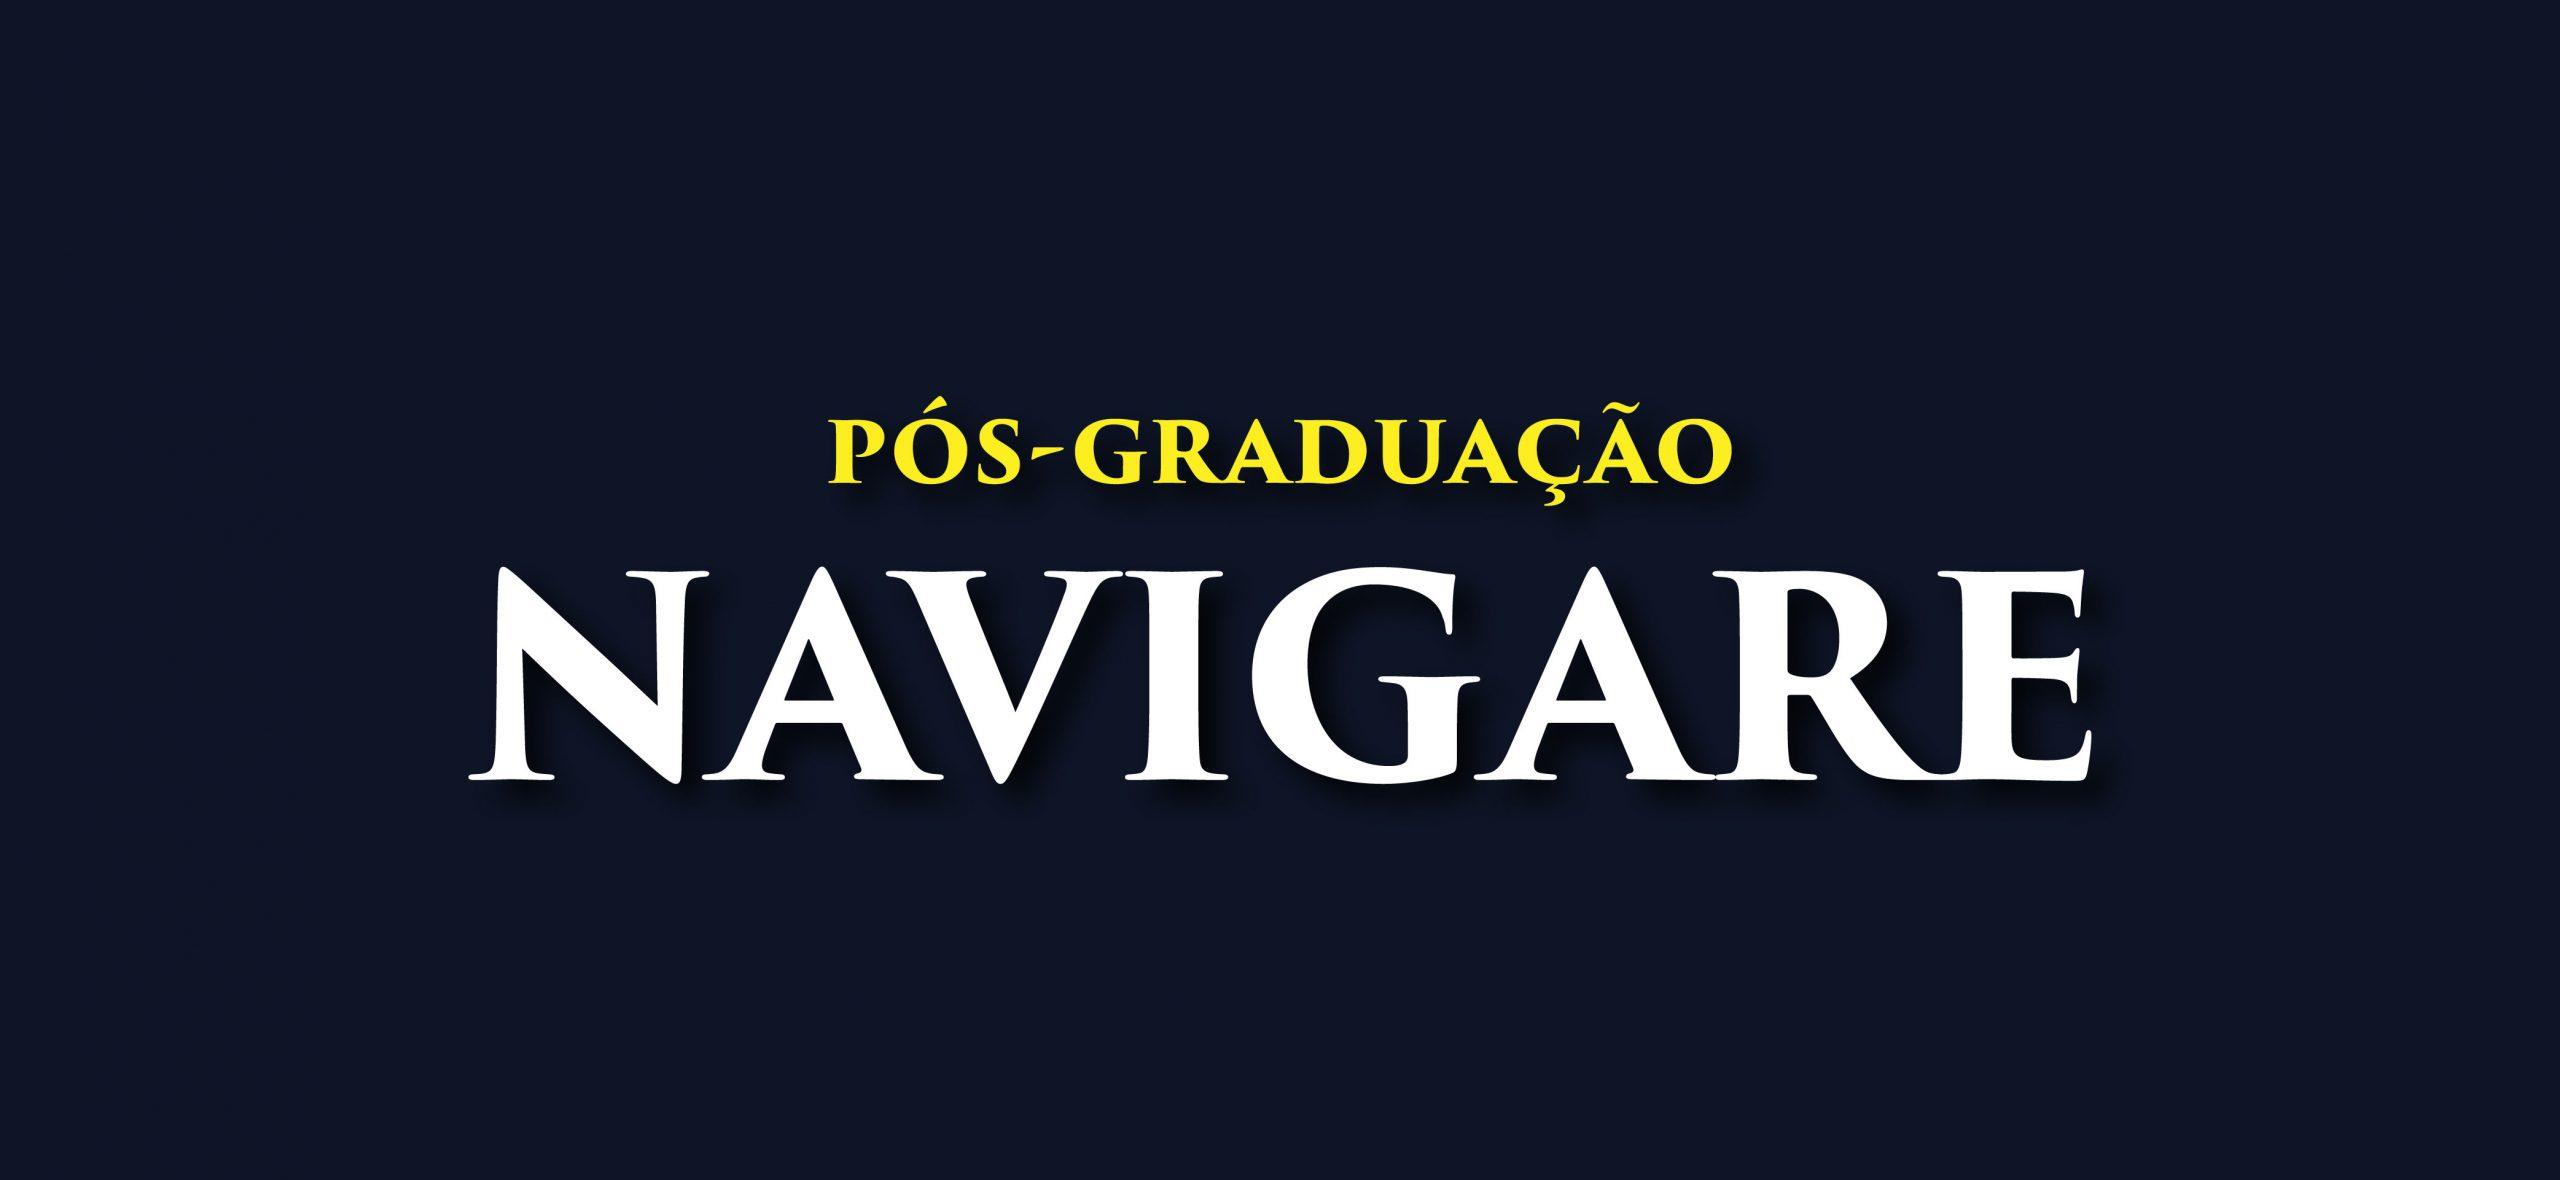 INSTITUTO NAVIGARE